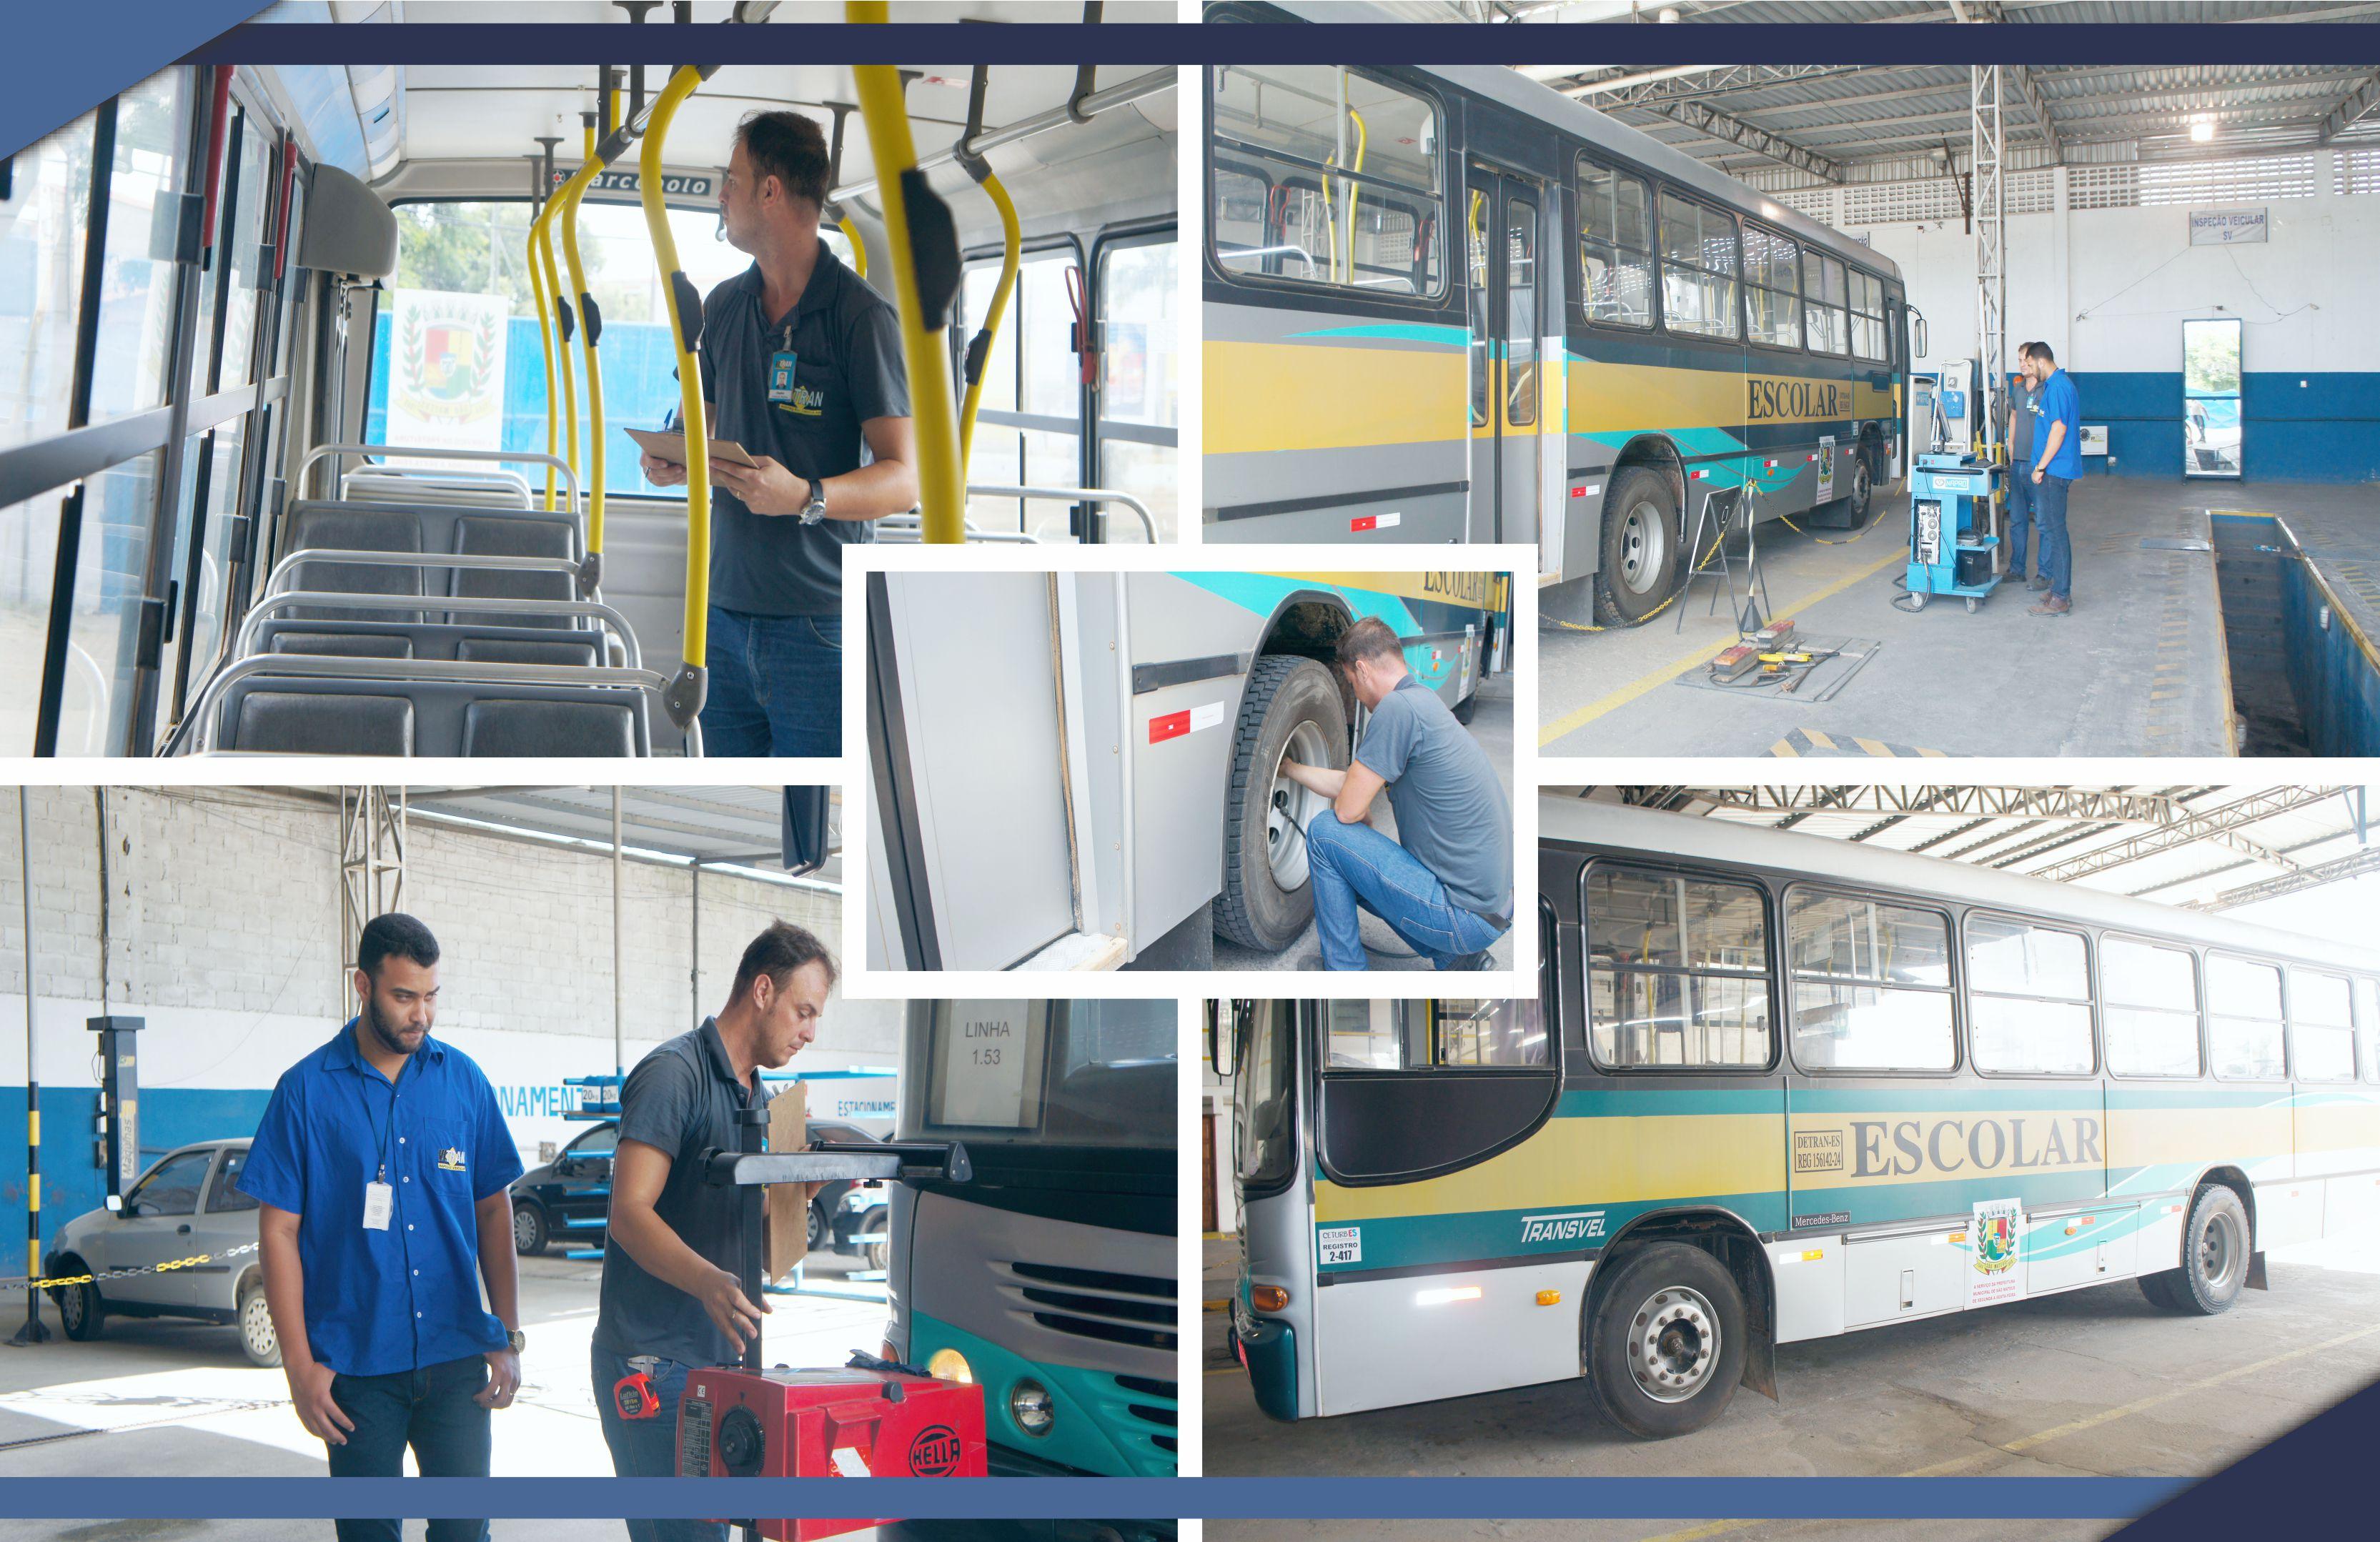 Prefeitura esclarece sobre transporte escolar no Município